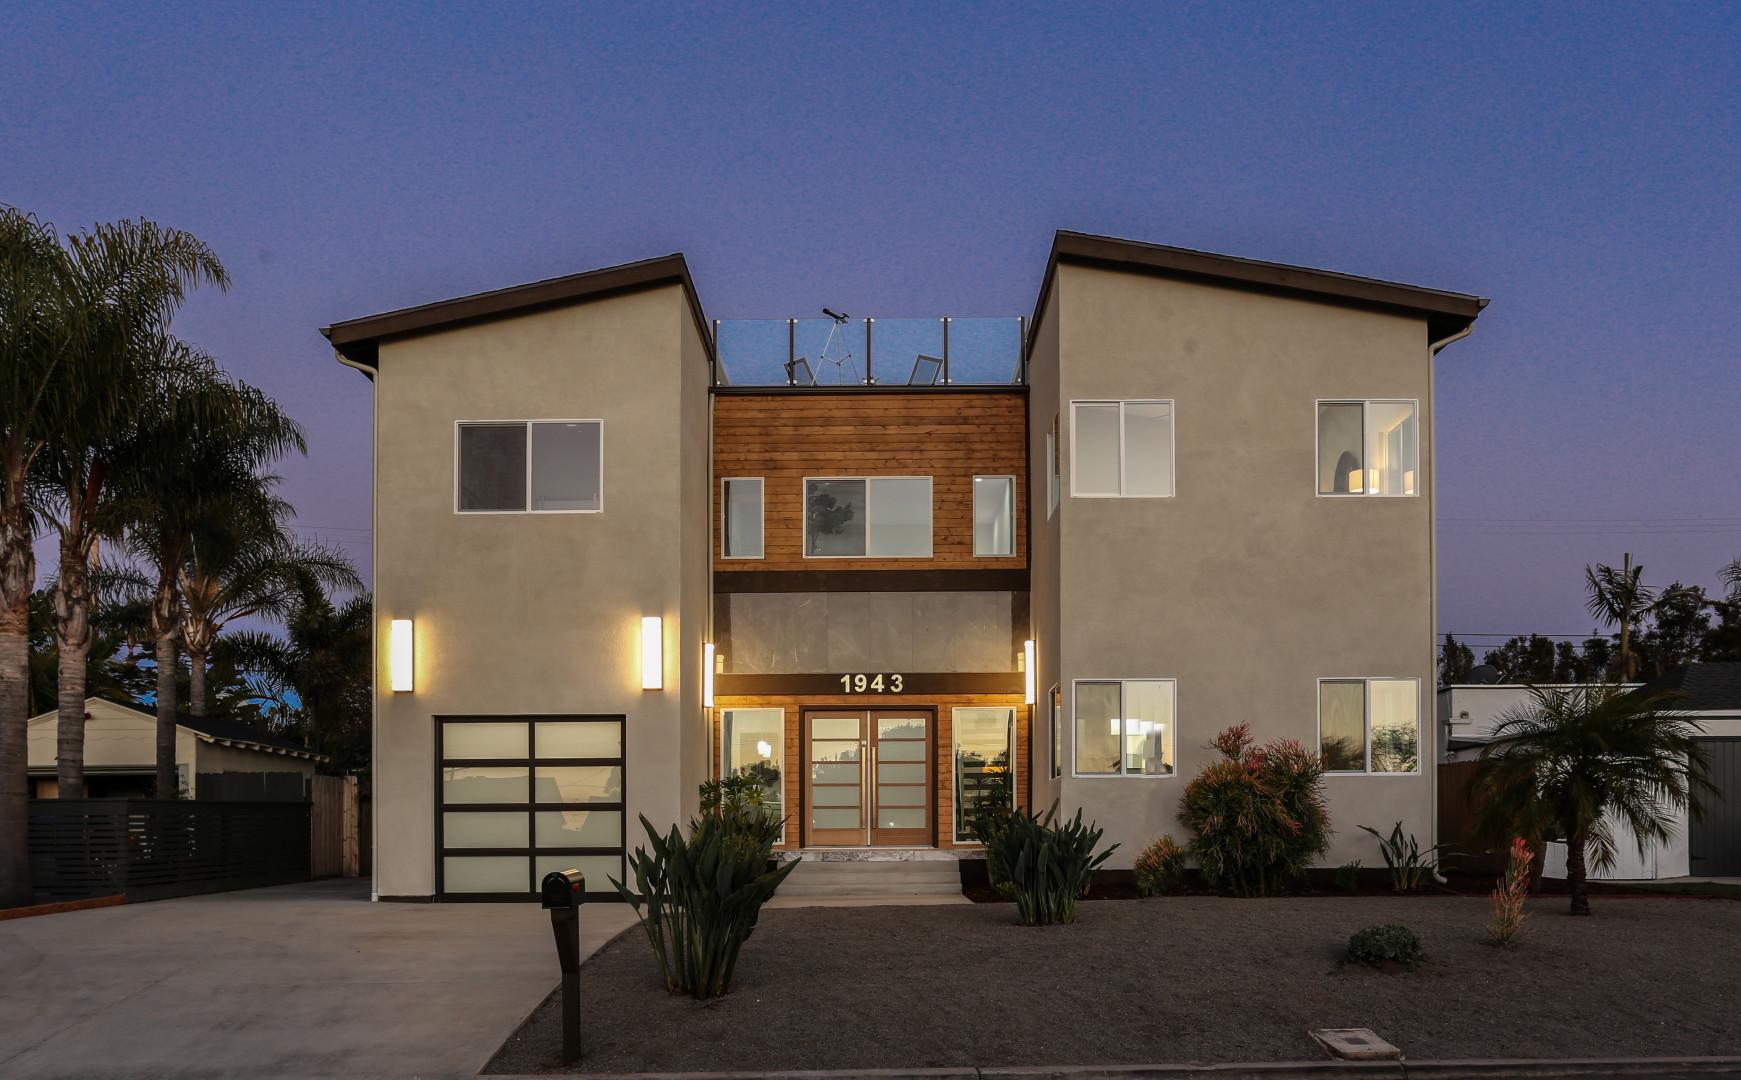 1943 Goldfield St San Diego, CA 92110